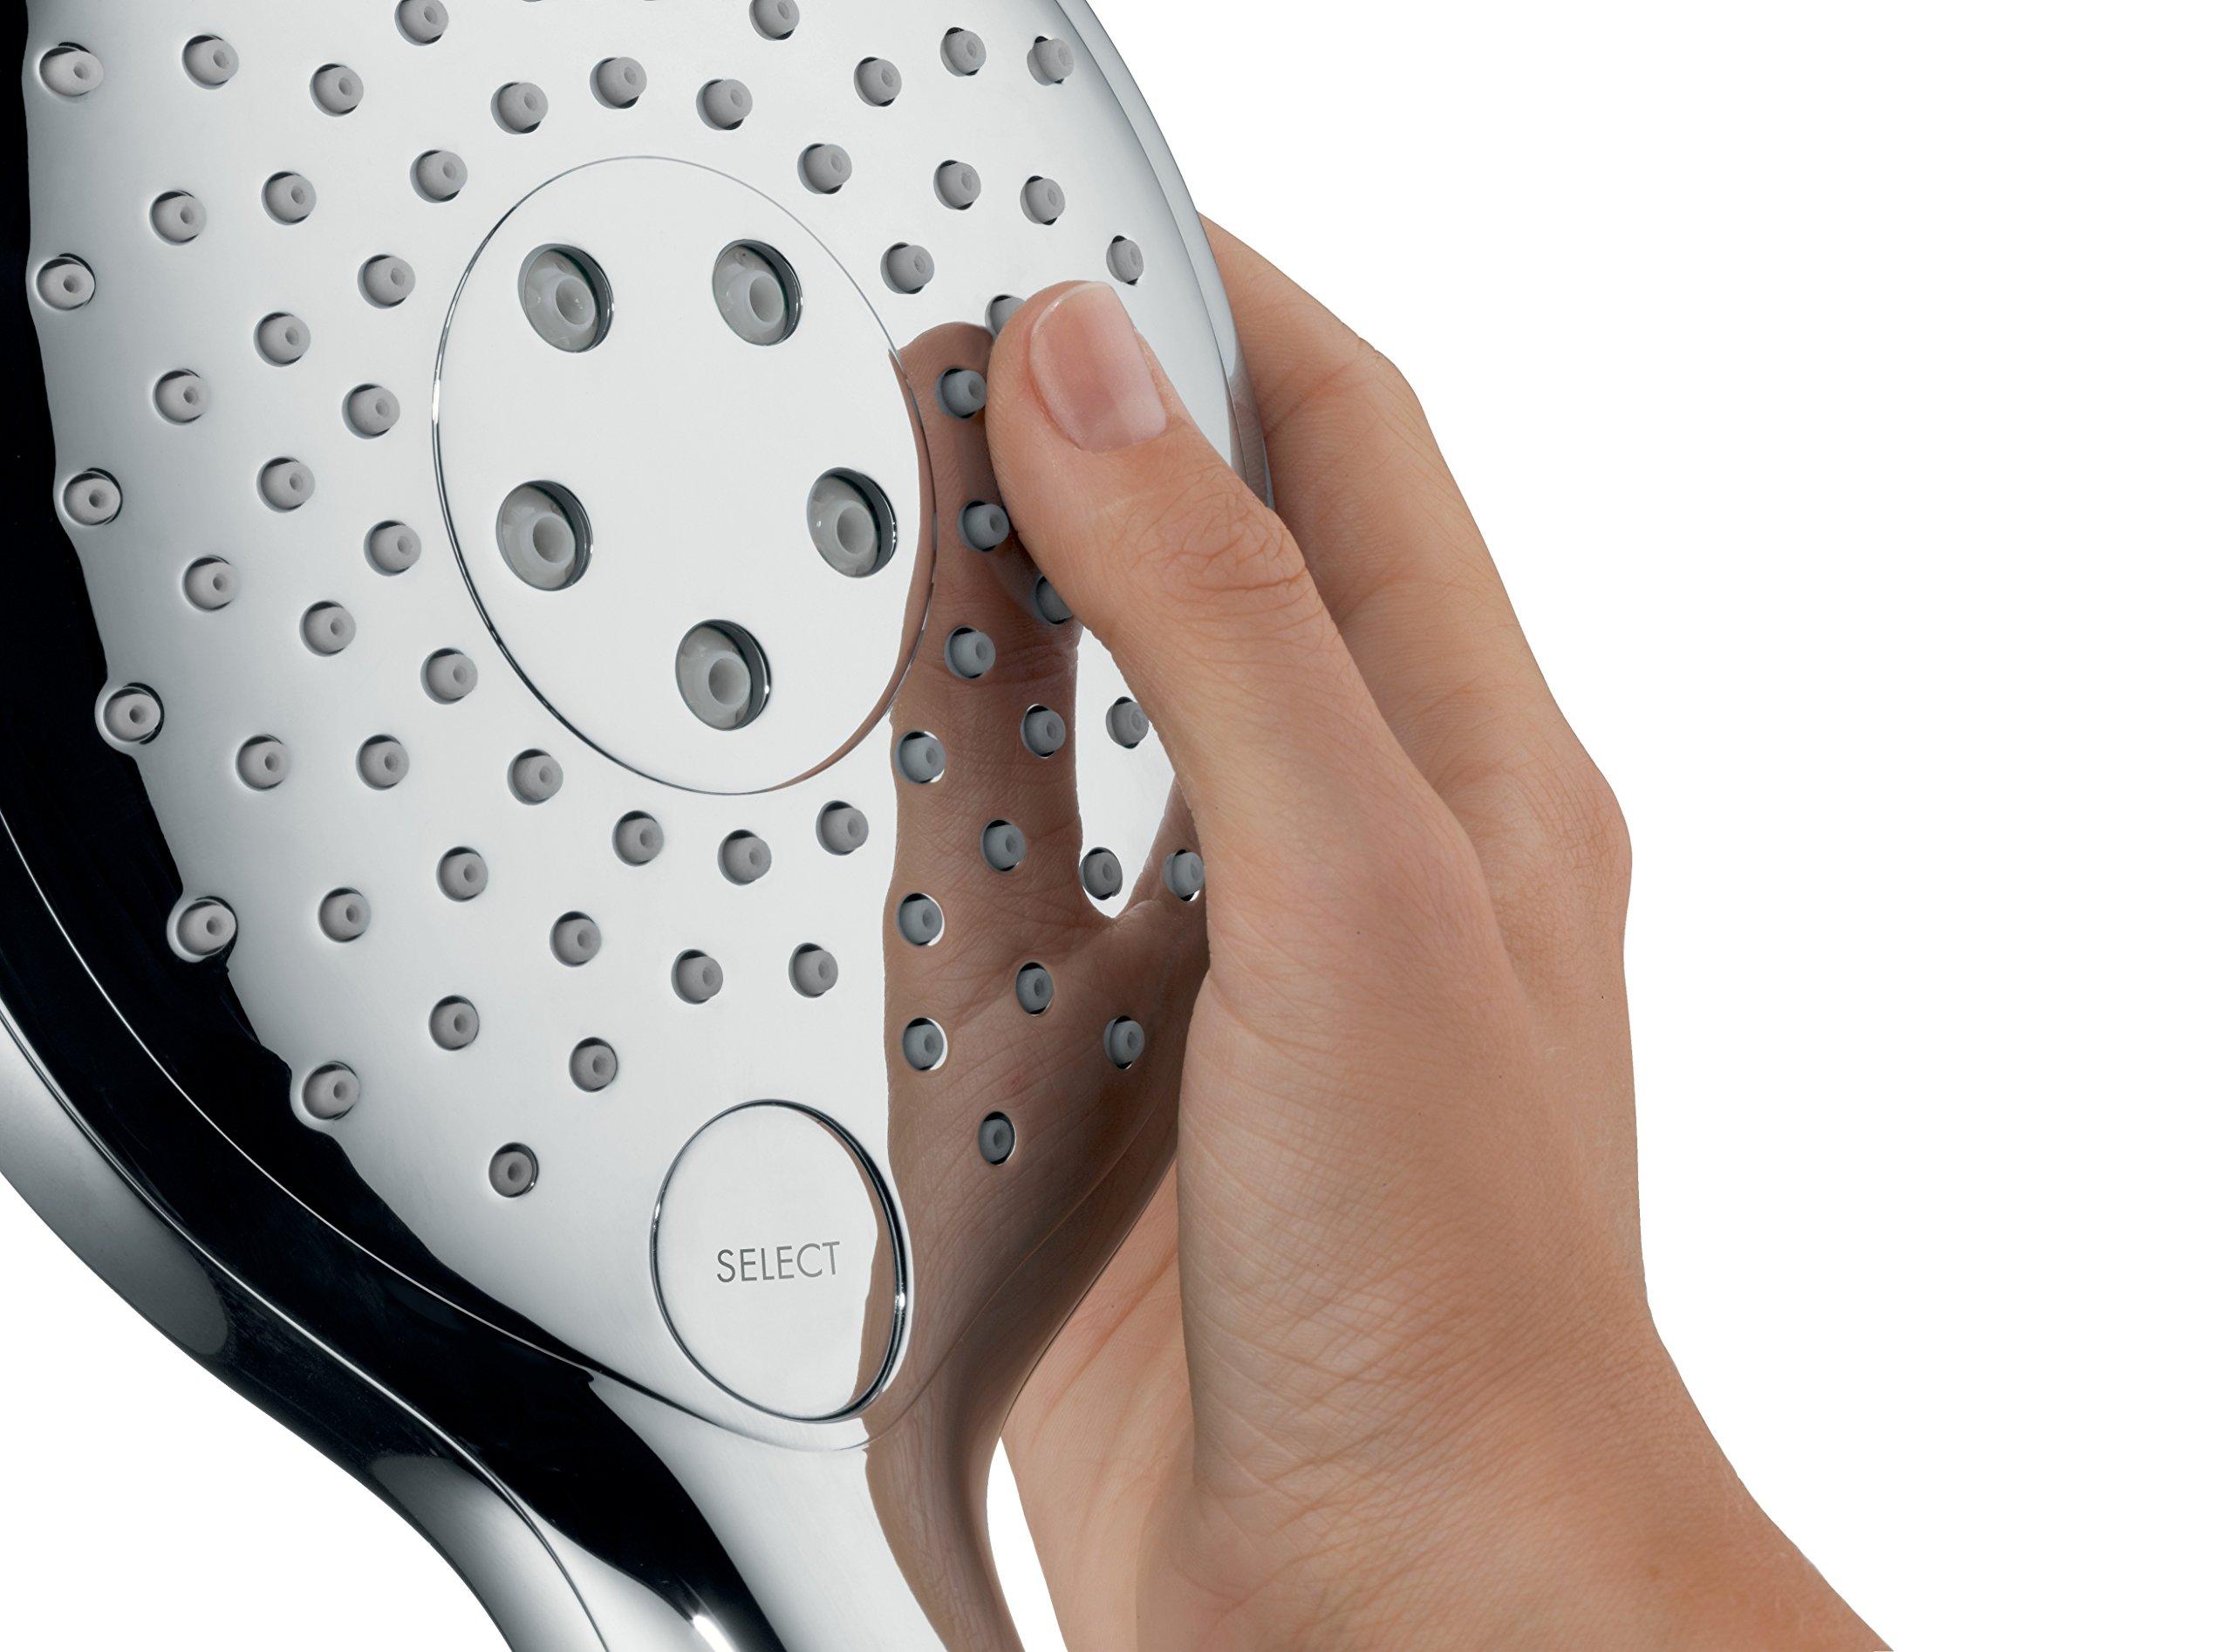 blanco//cromo Hansgrohe 26626400 Raindance Select S 150 set de ducha 3 tipos de chorro